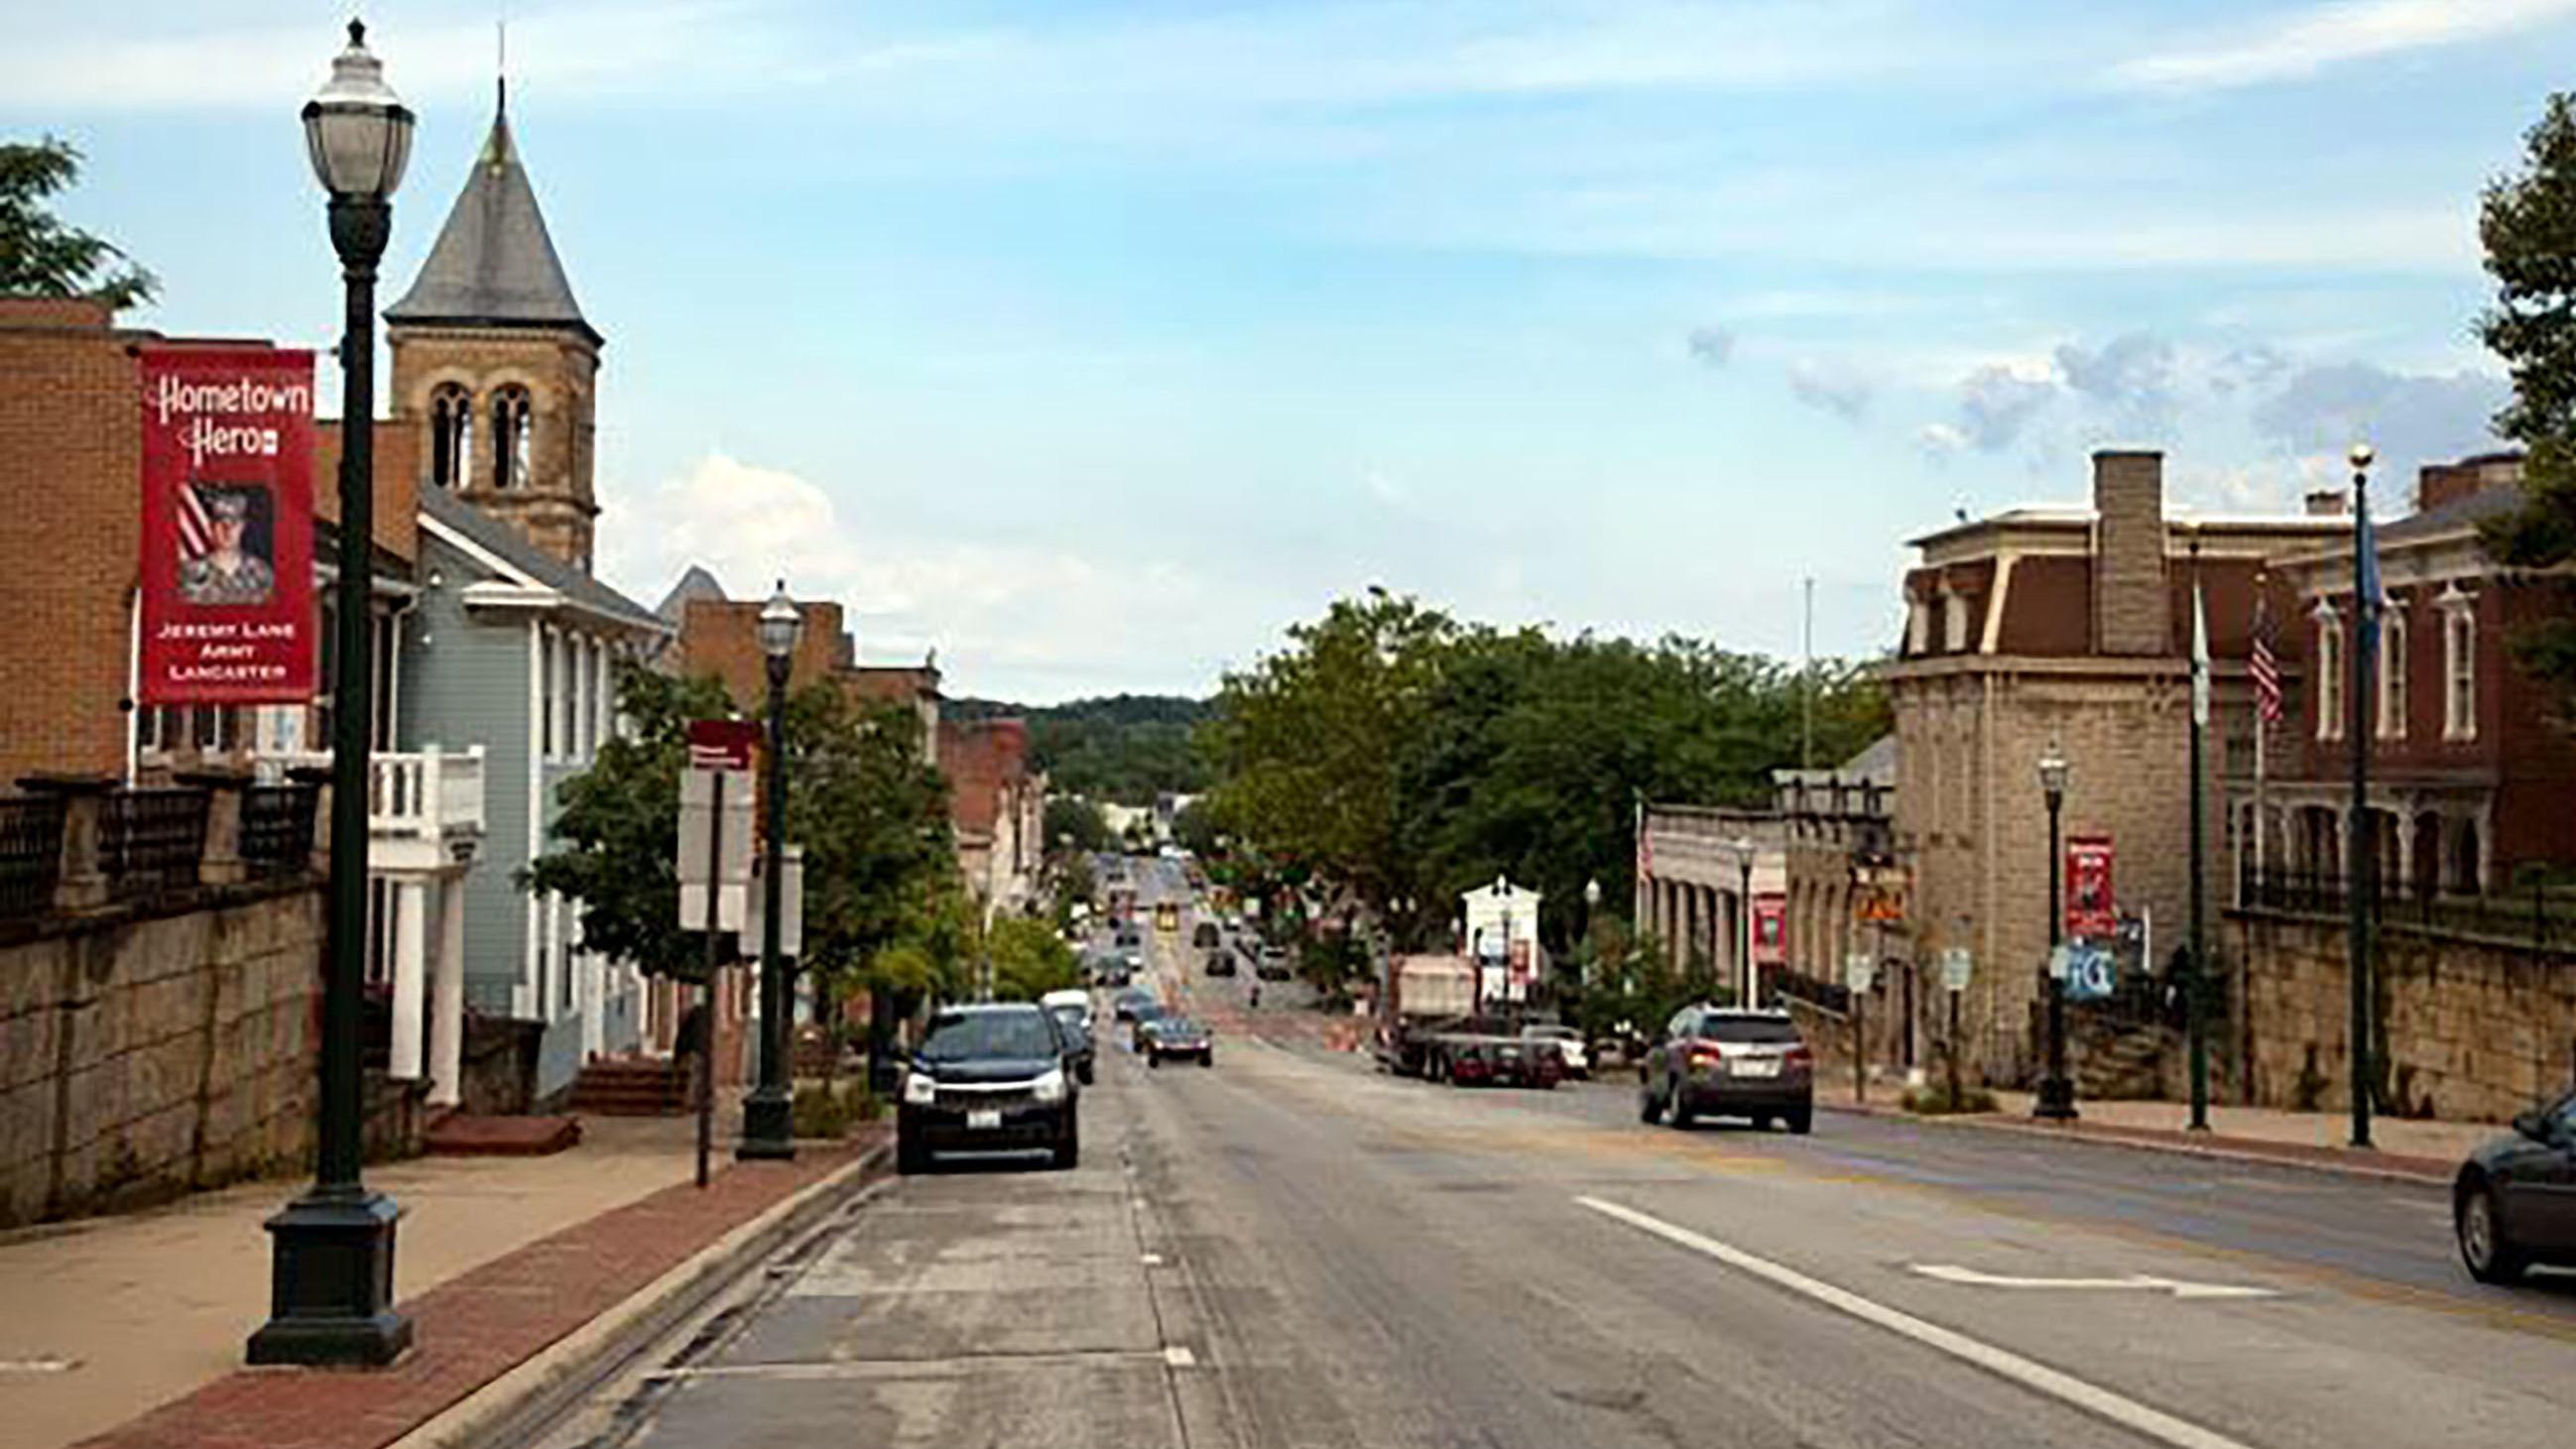 Lovely U0027Glass Houseu0027 Chronicles The Sharp Decline Of An All American Factory Town  : NPR